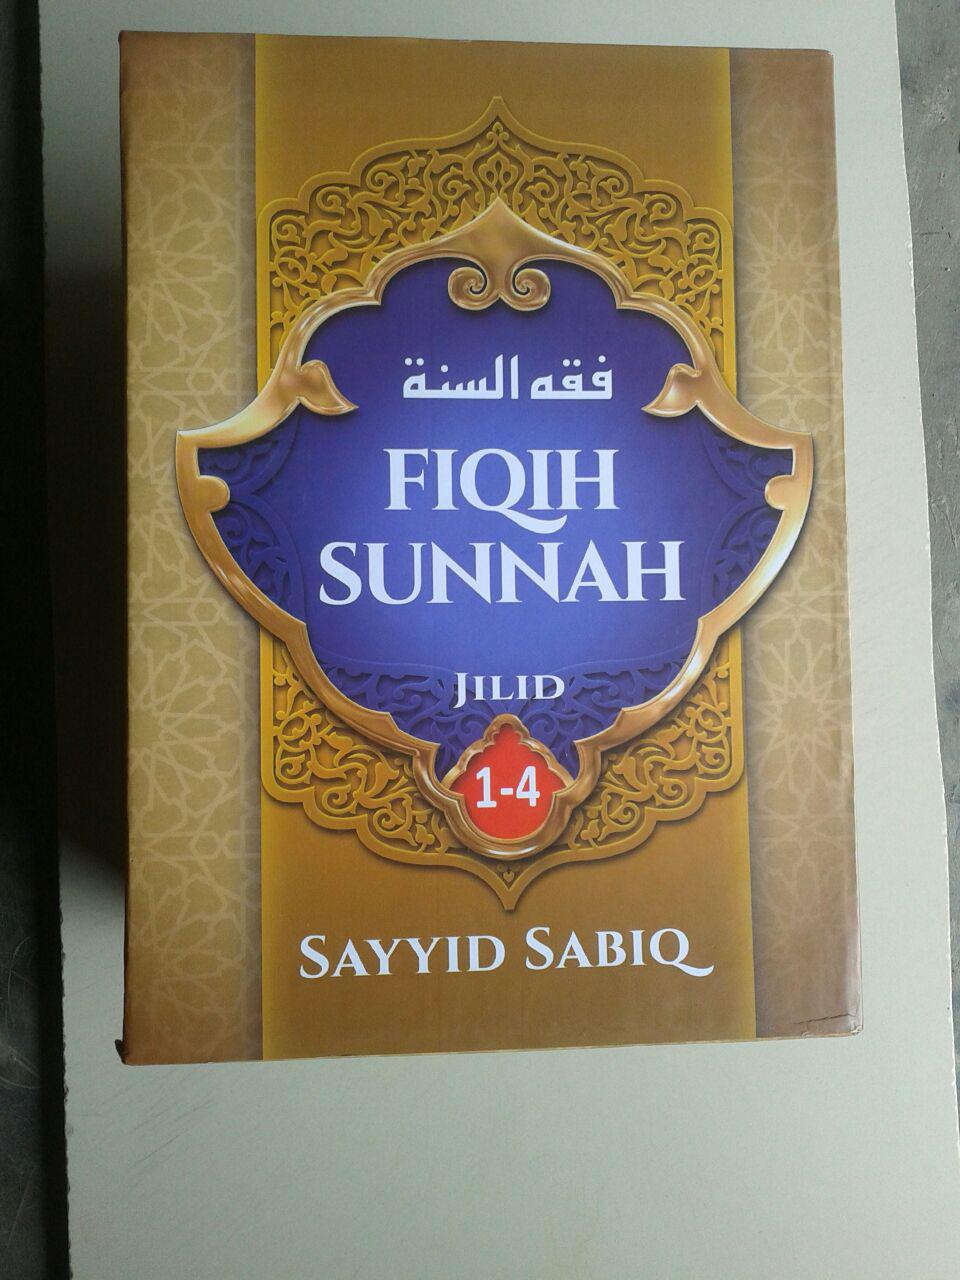 Buku Fiqih Sunnah Sayyid Sabiq Set 4 Jilid cover 3